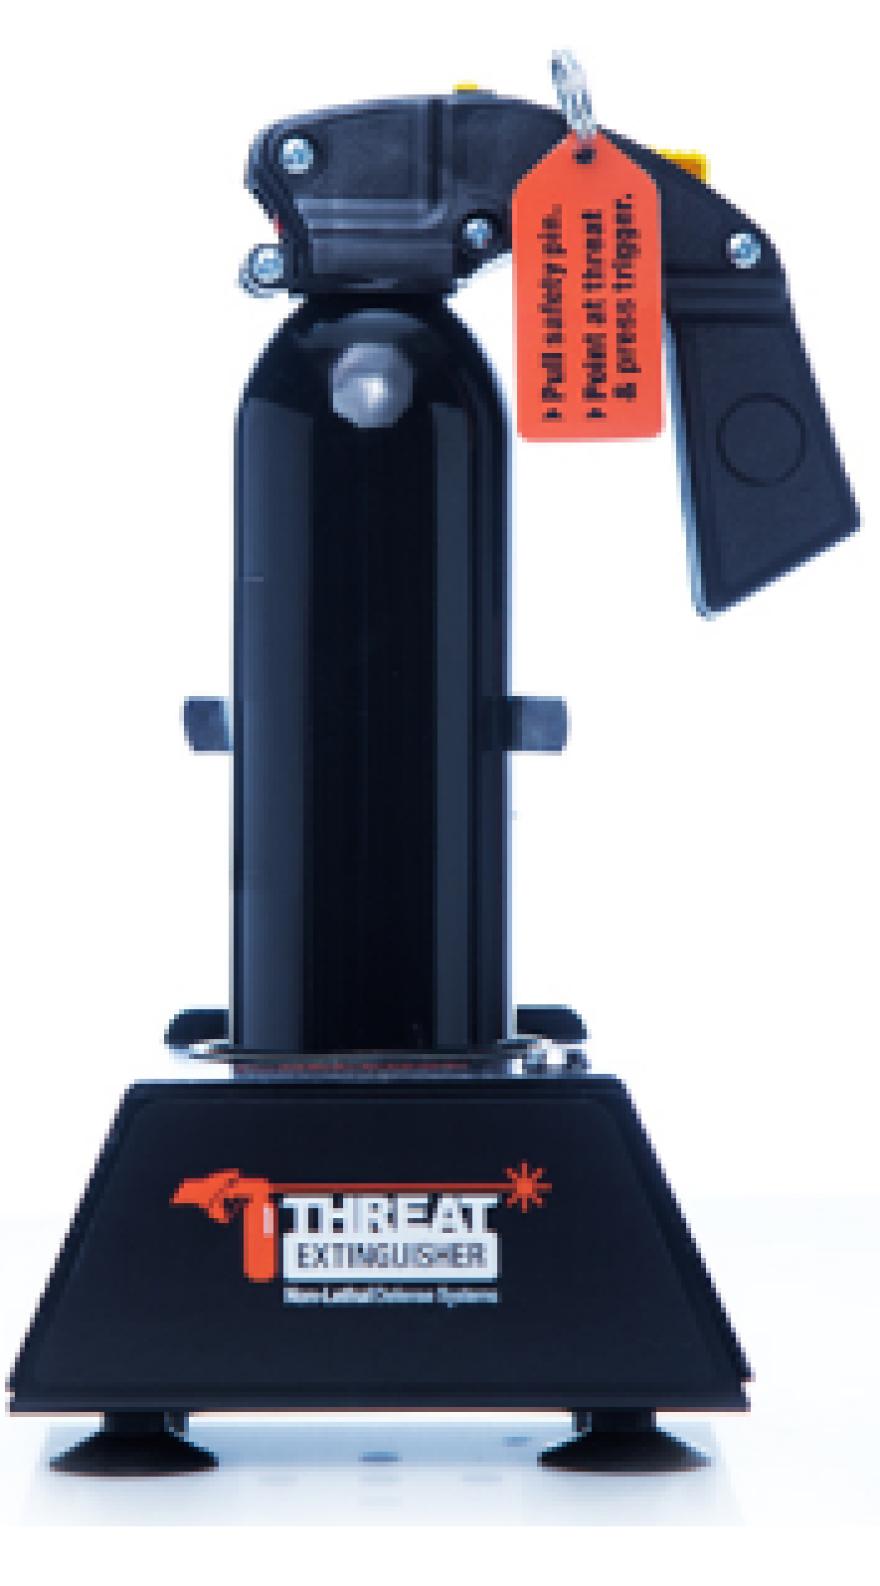 photo of Threat Extinguisher